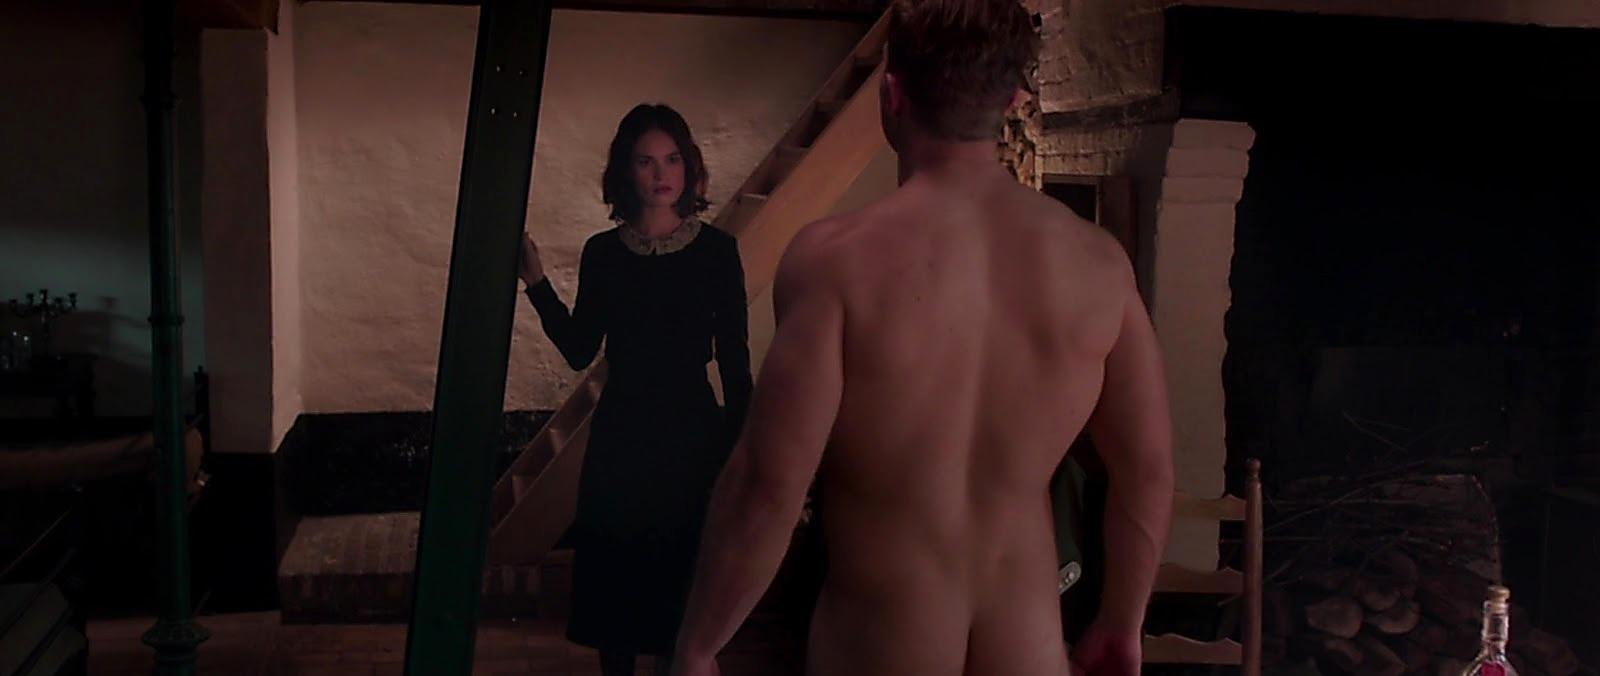 Jai Courtney sexy shirtless scene April 27, 2017, 11am